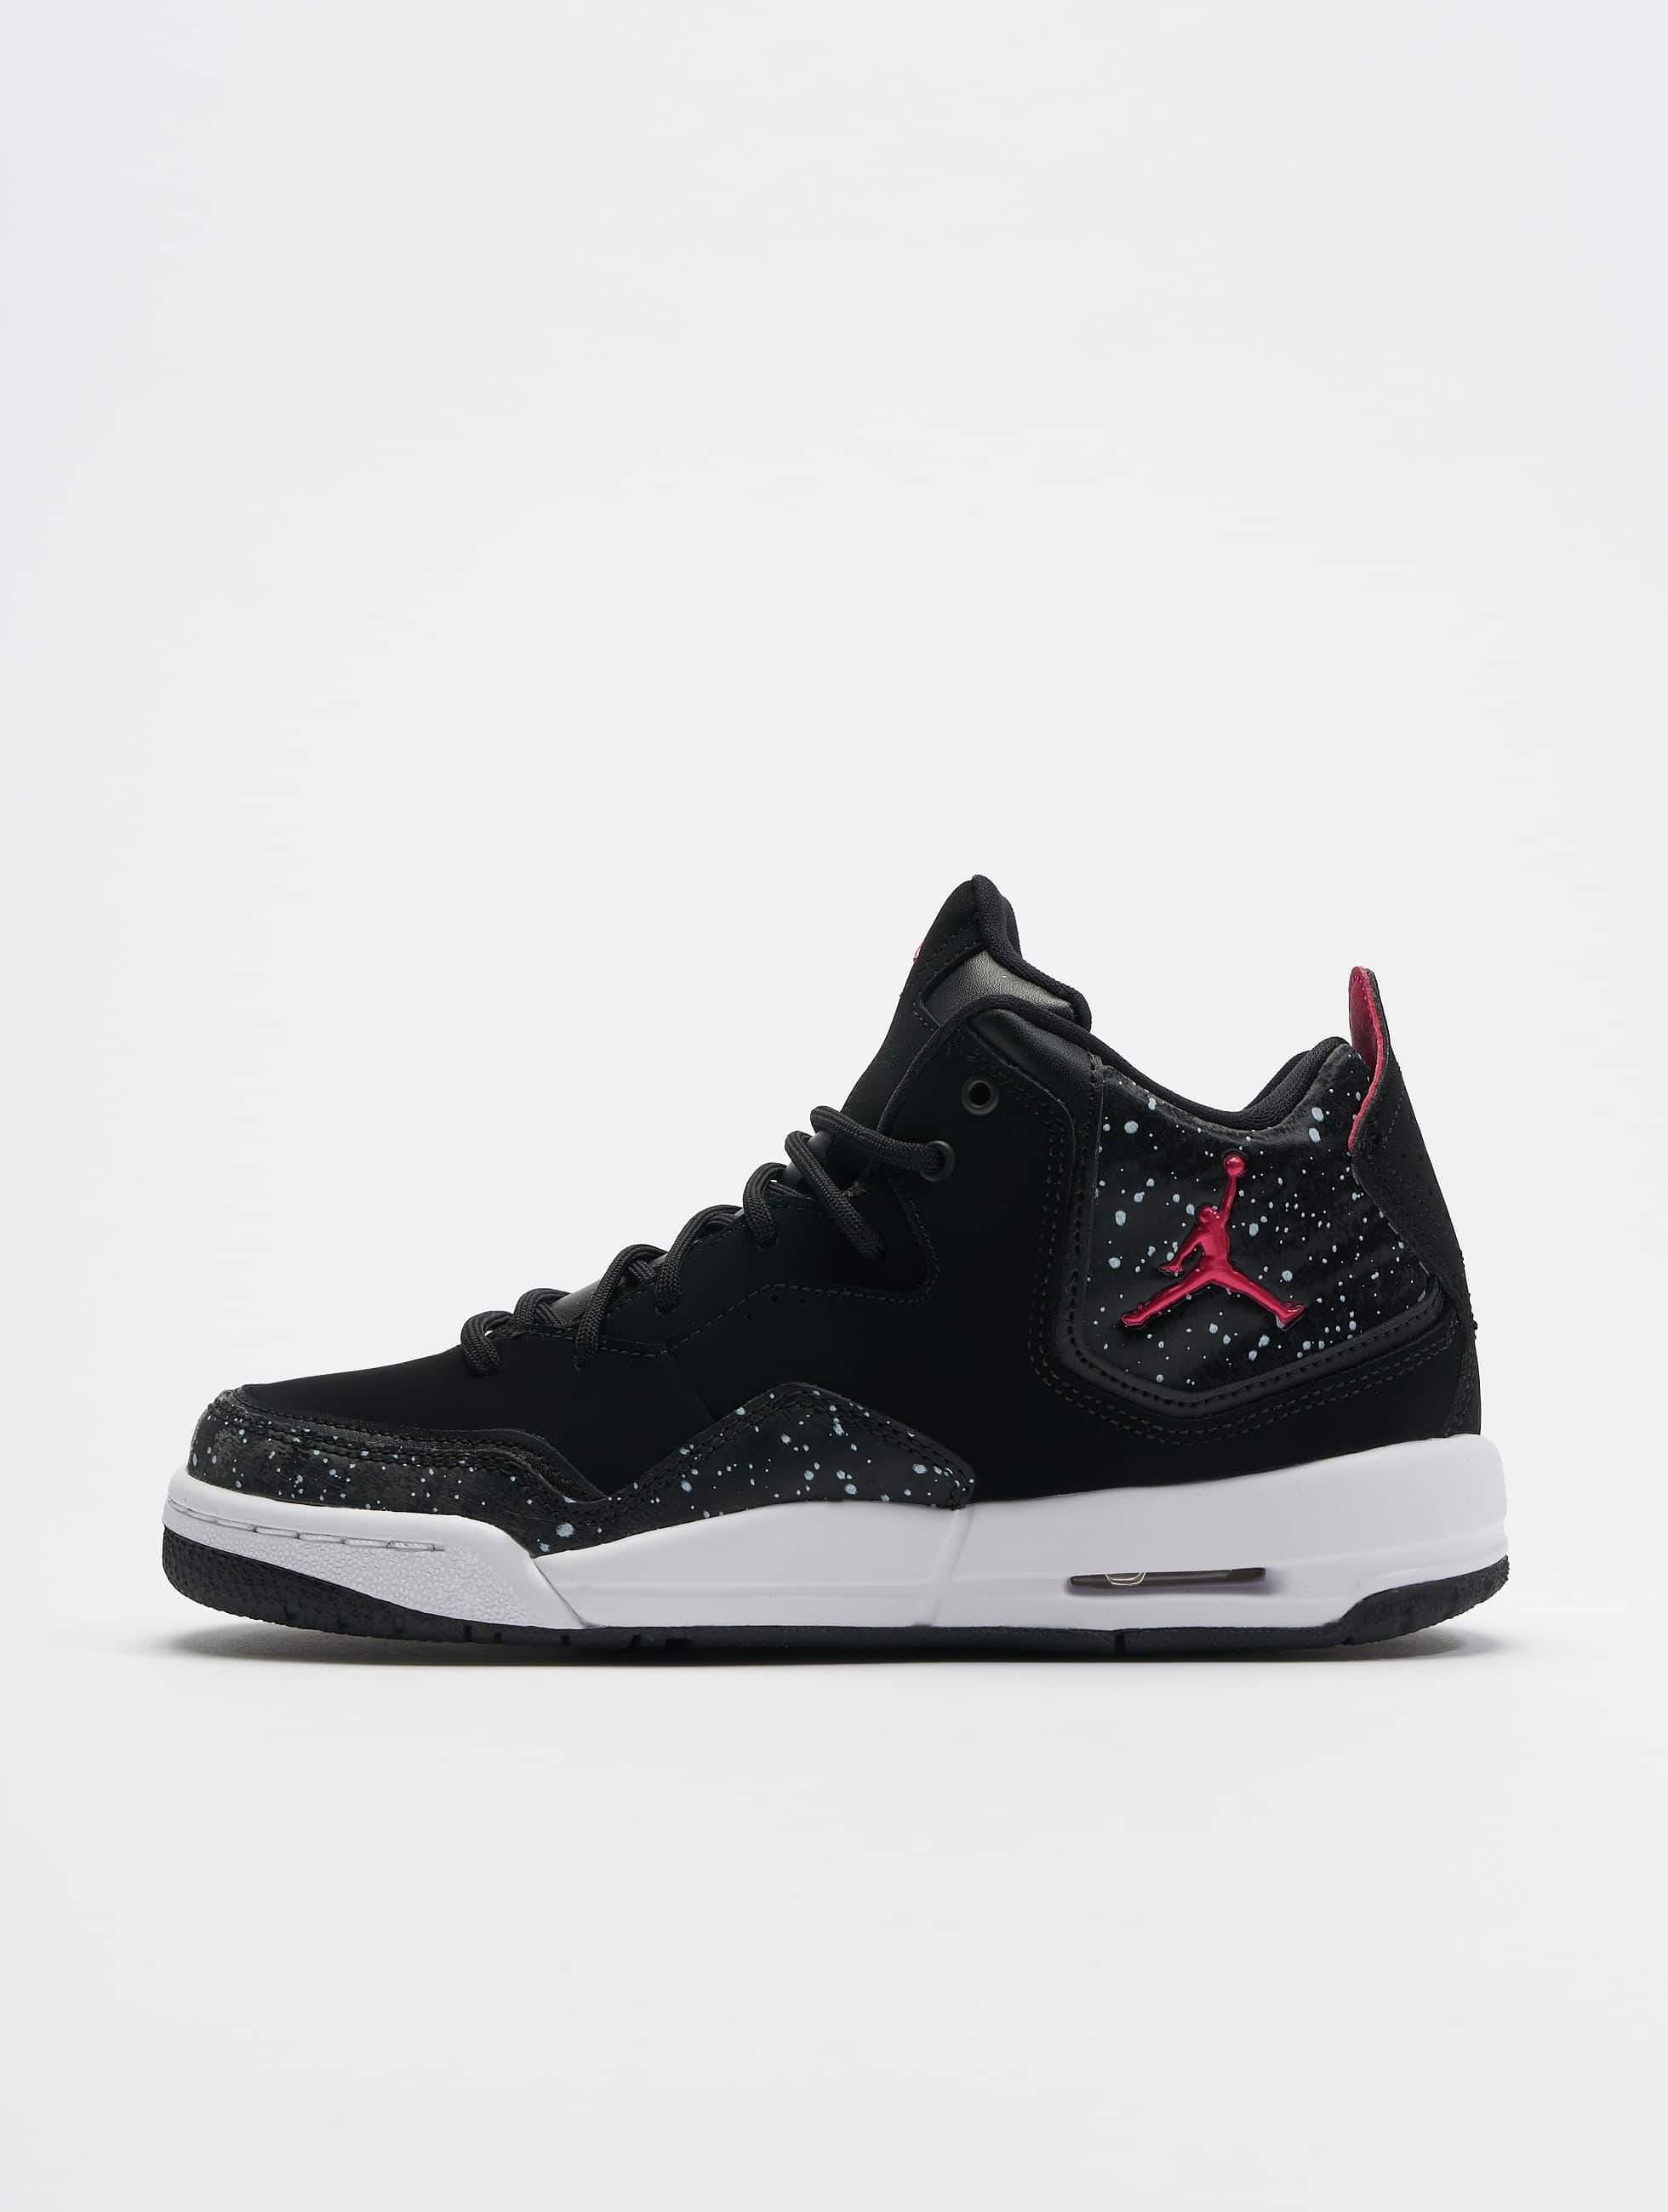 Pink Jordan 23 Sneakers Courtside Blackwhiterush ikXZOPu